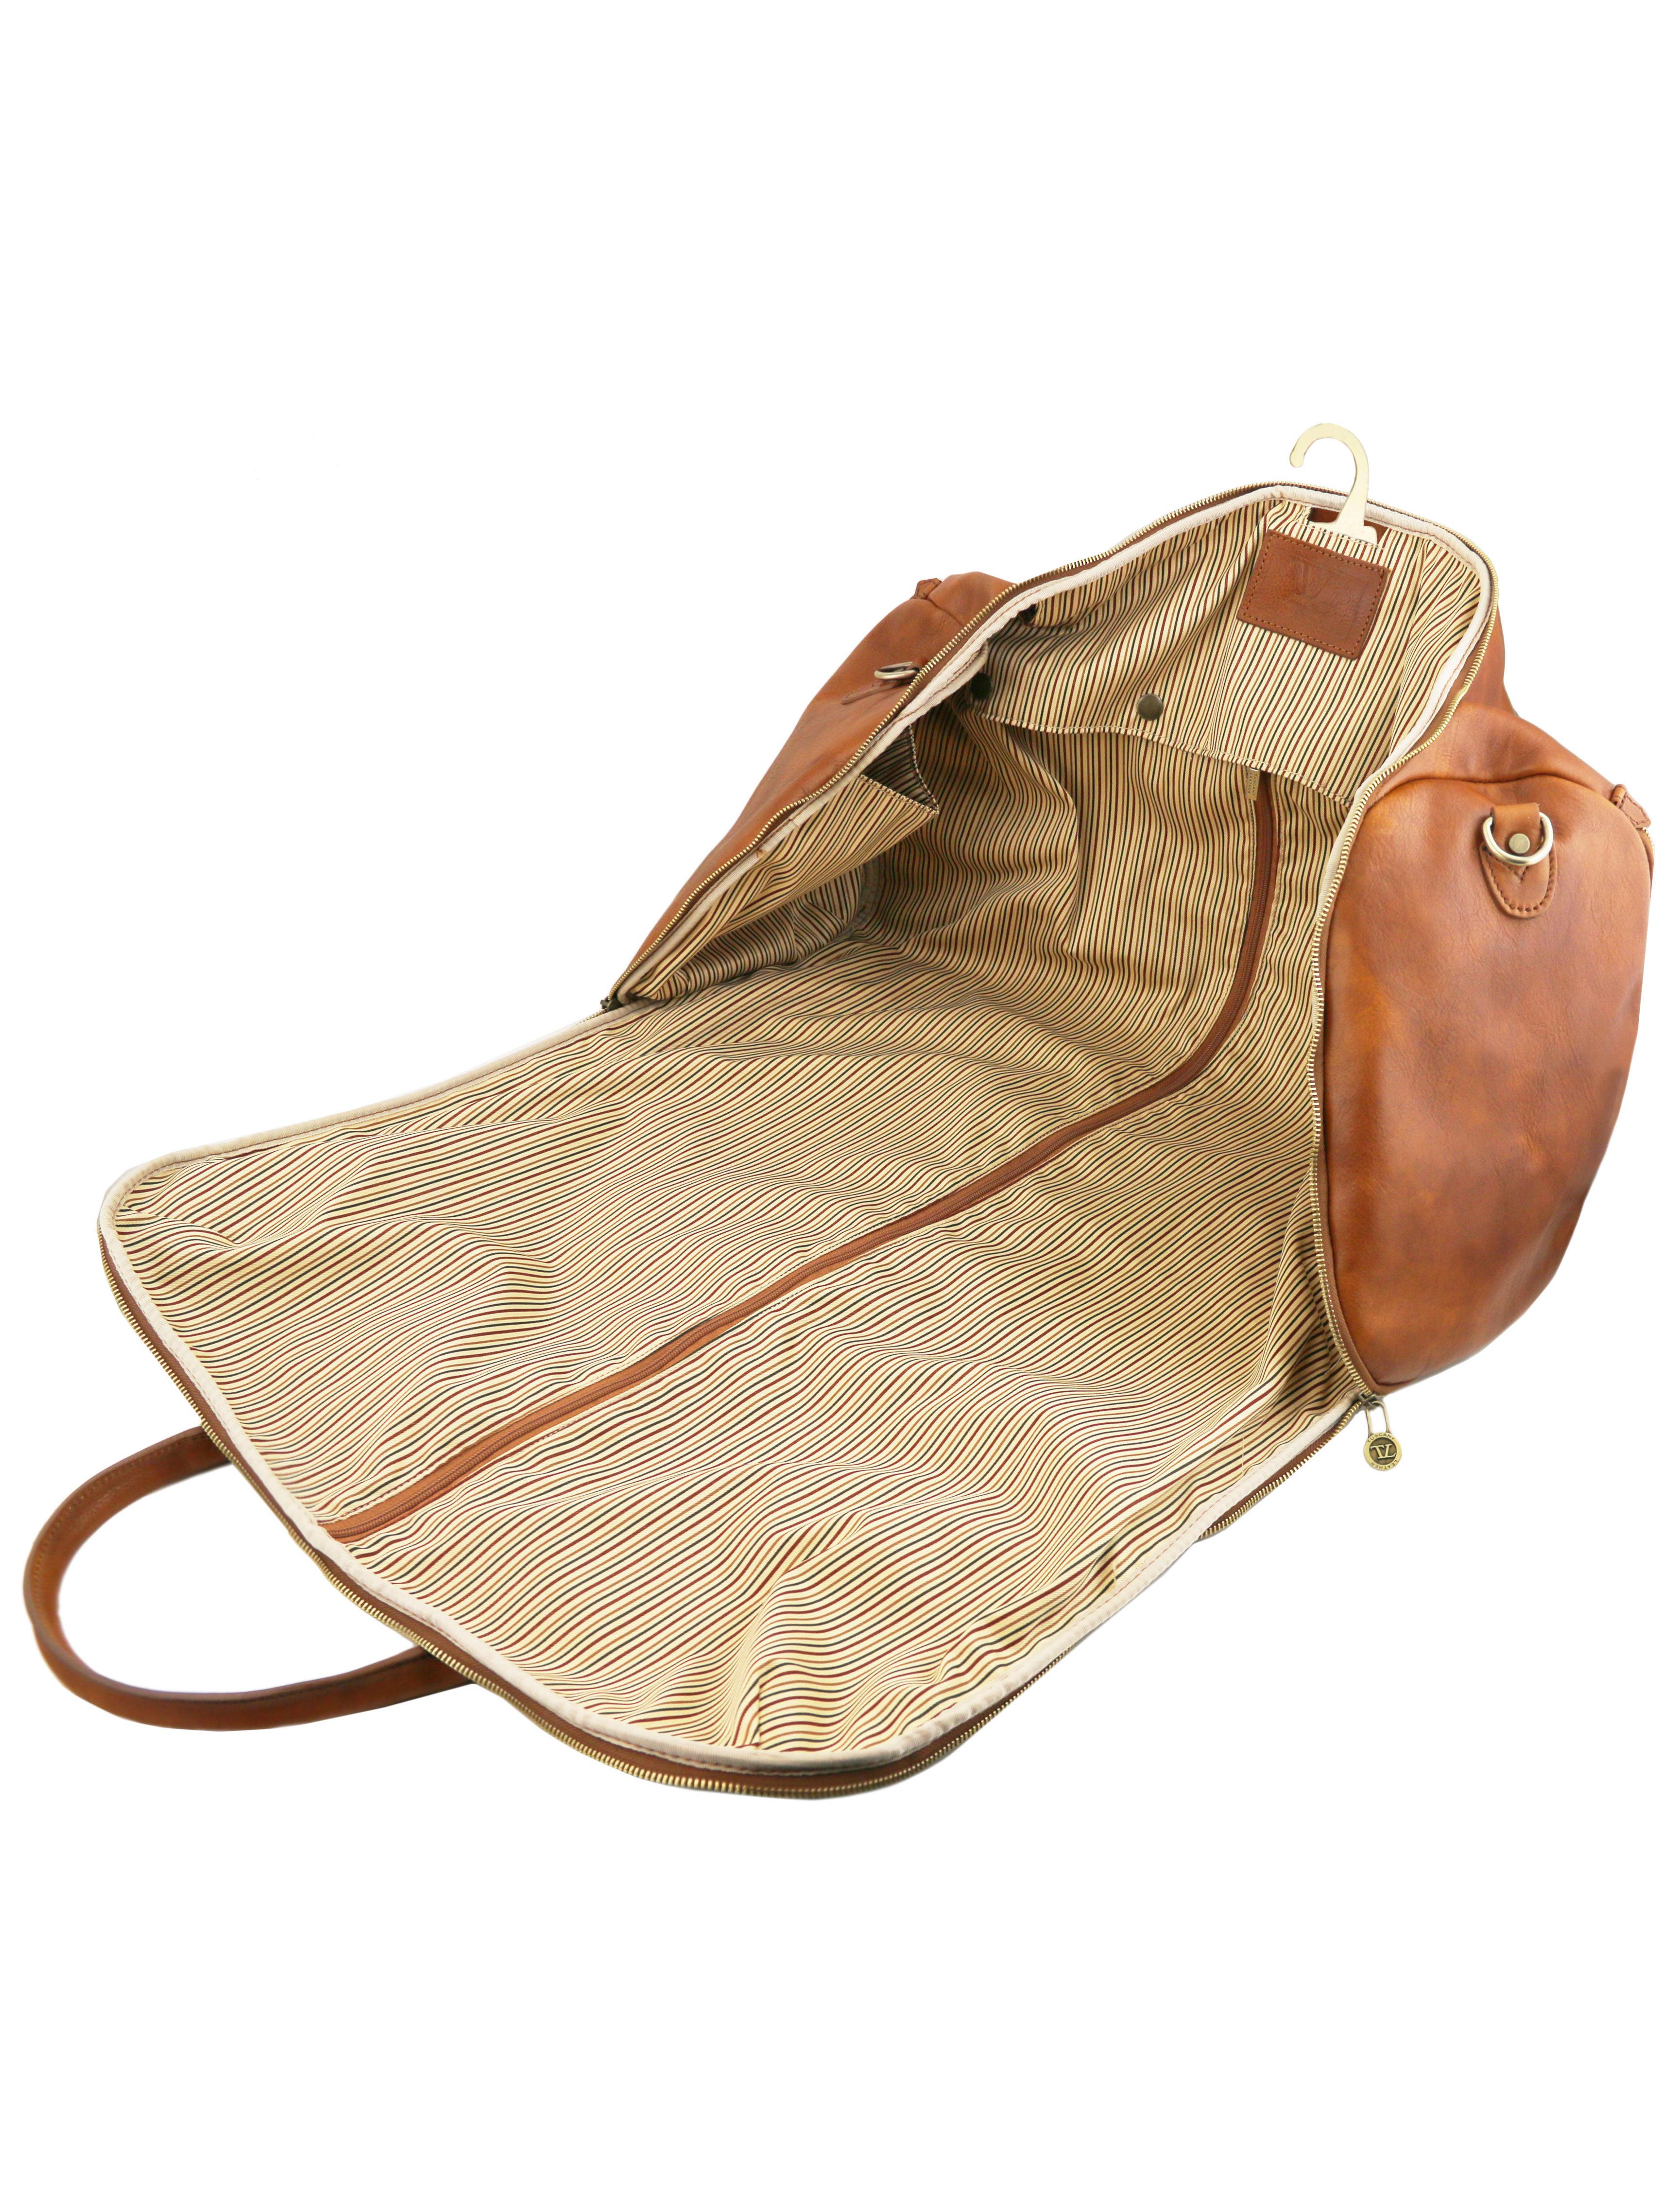 Geanta pentru costum, piele naturala maro, Tuscany Leather, Antigua